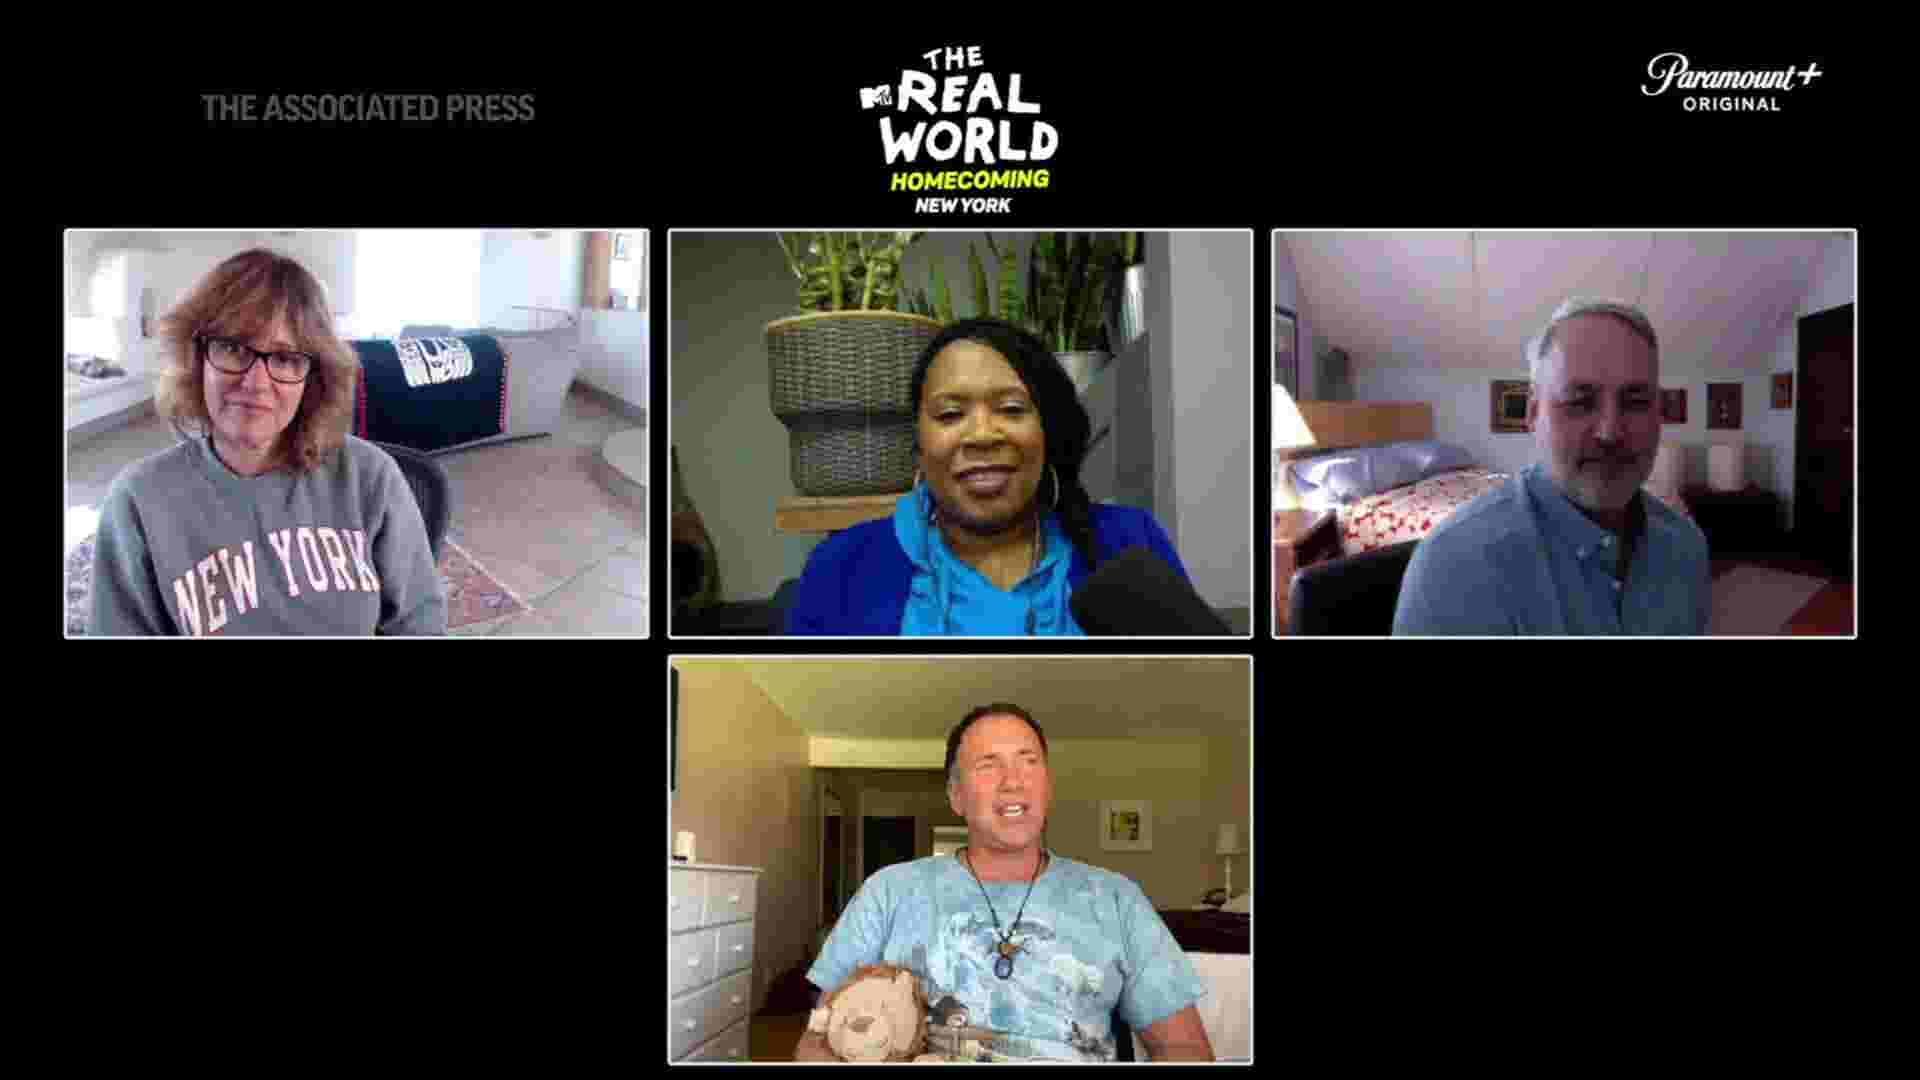 Pioneering original'Real World' cast talk reuniting for docuseries thumbnail